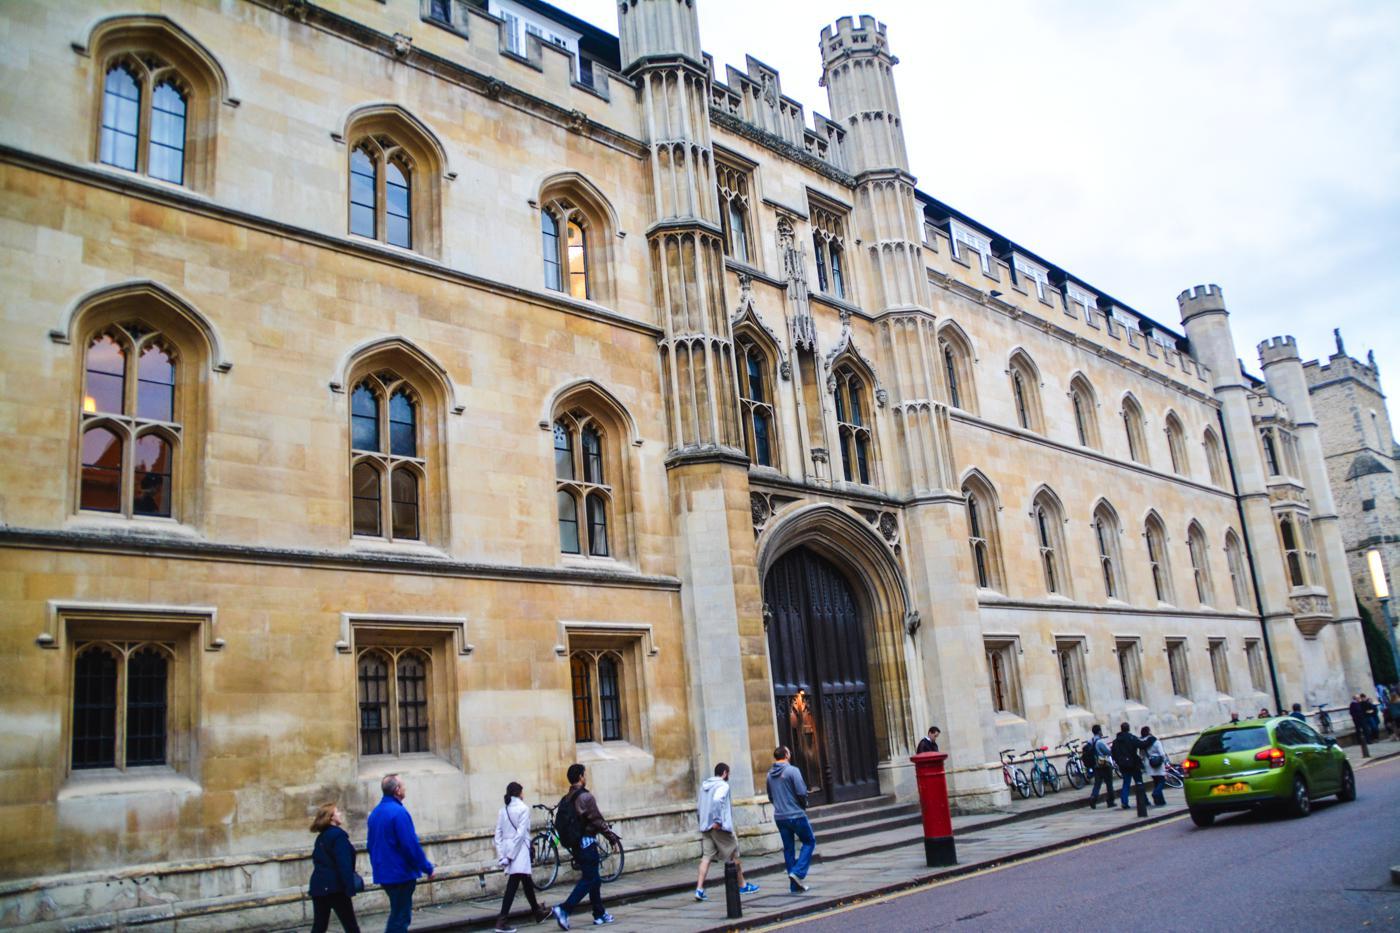 The University of Cambridge, Graduation, Senate House, Cambridge, England (5)